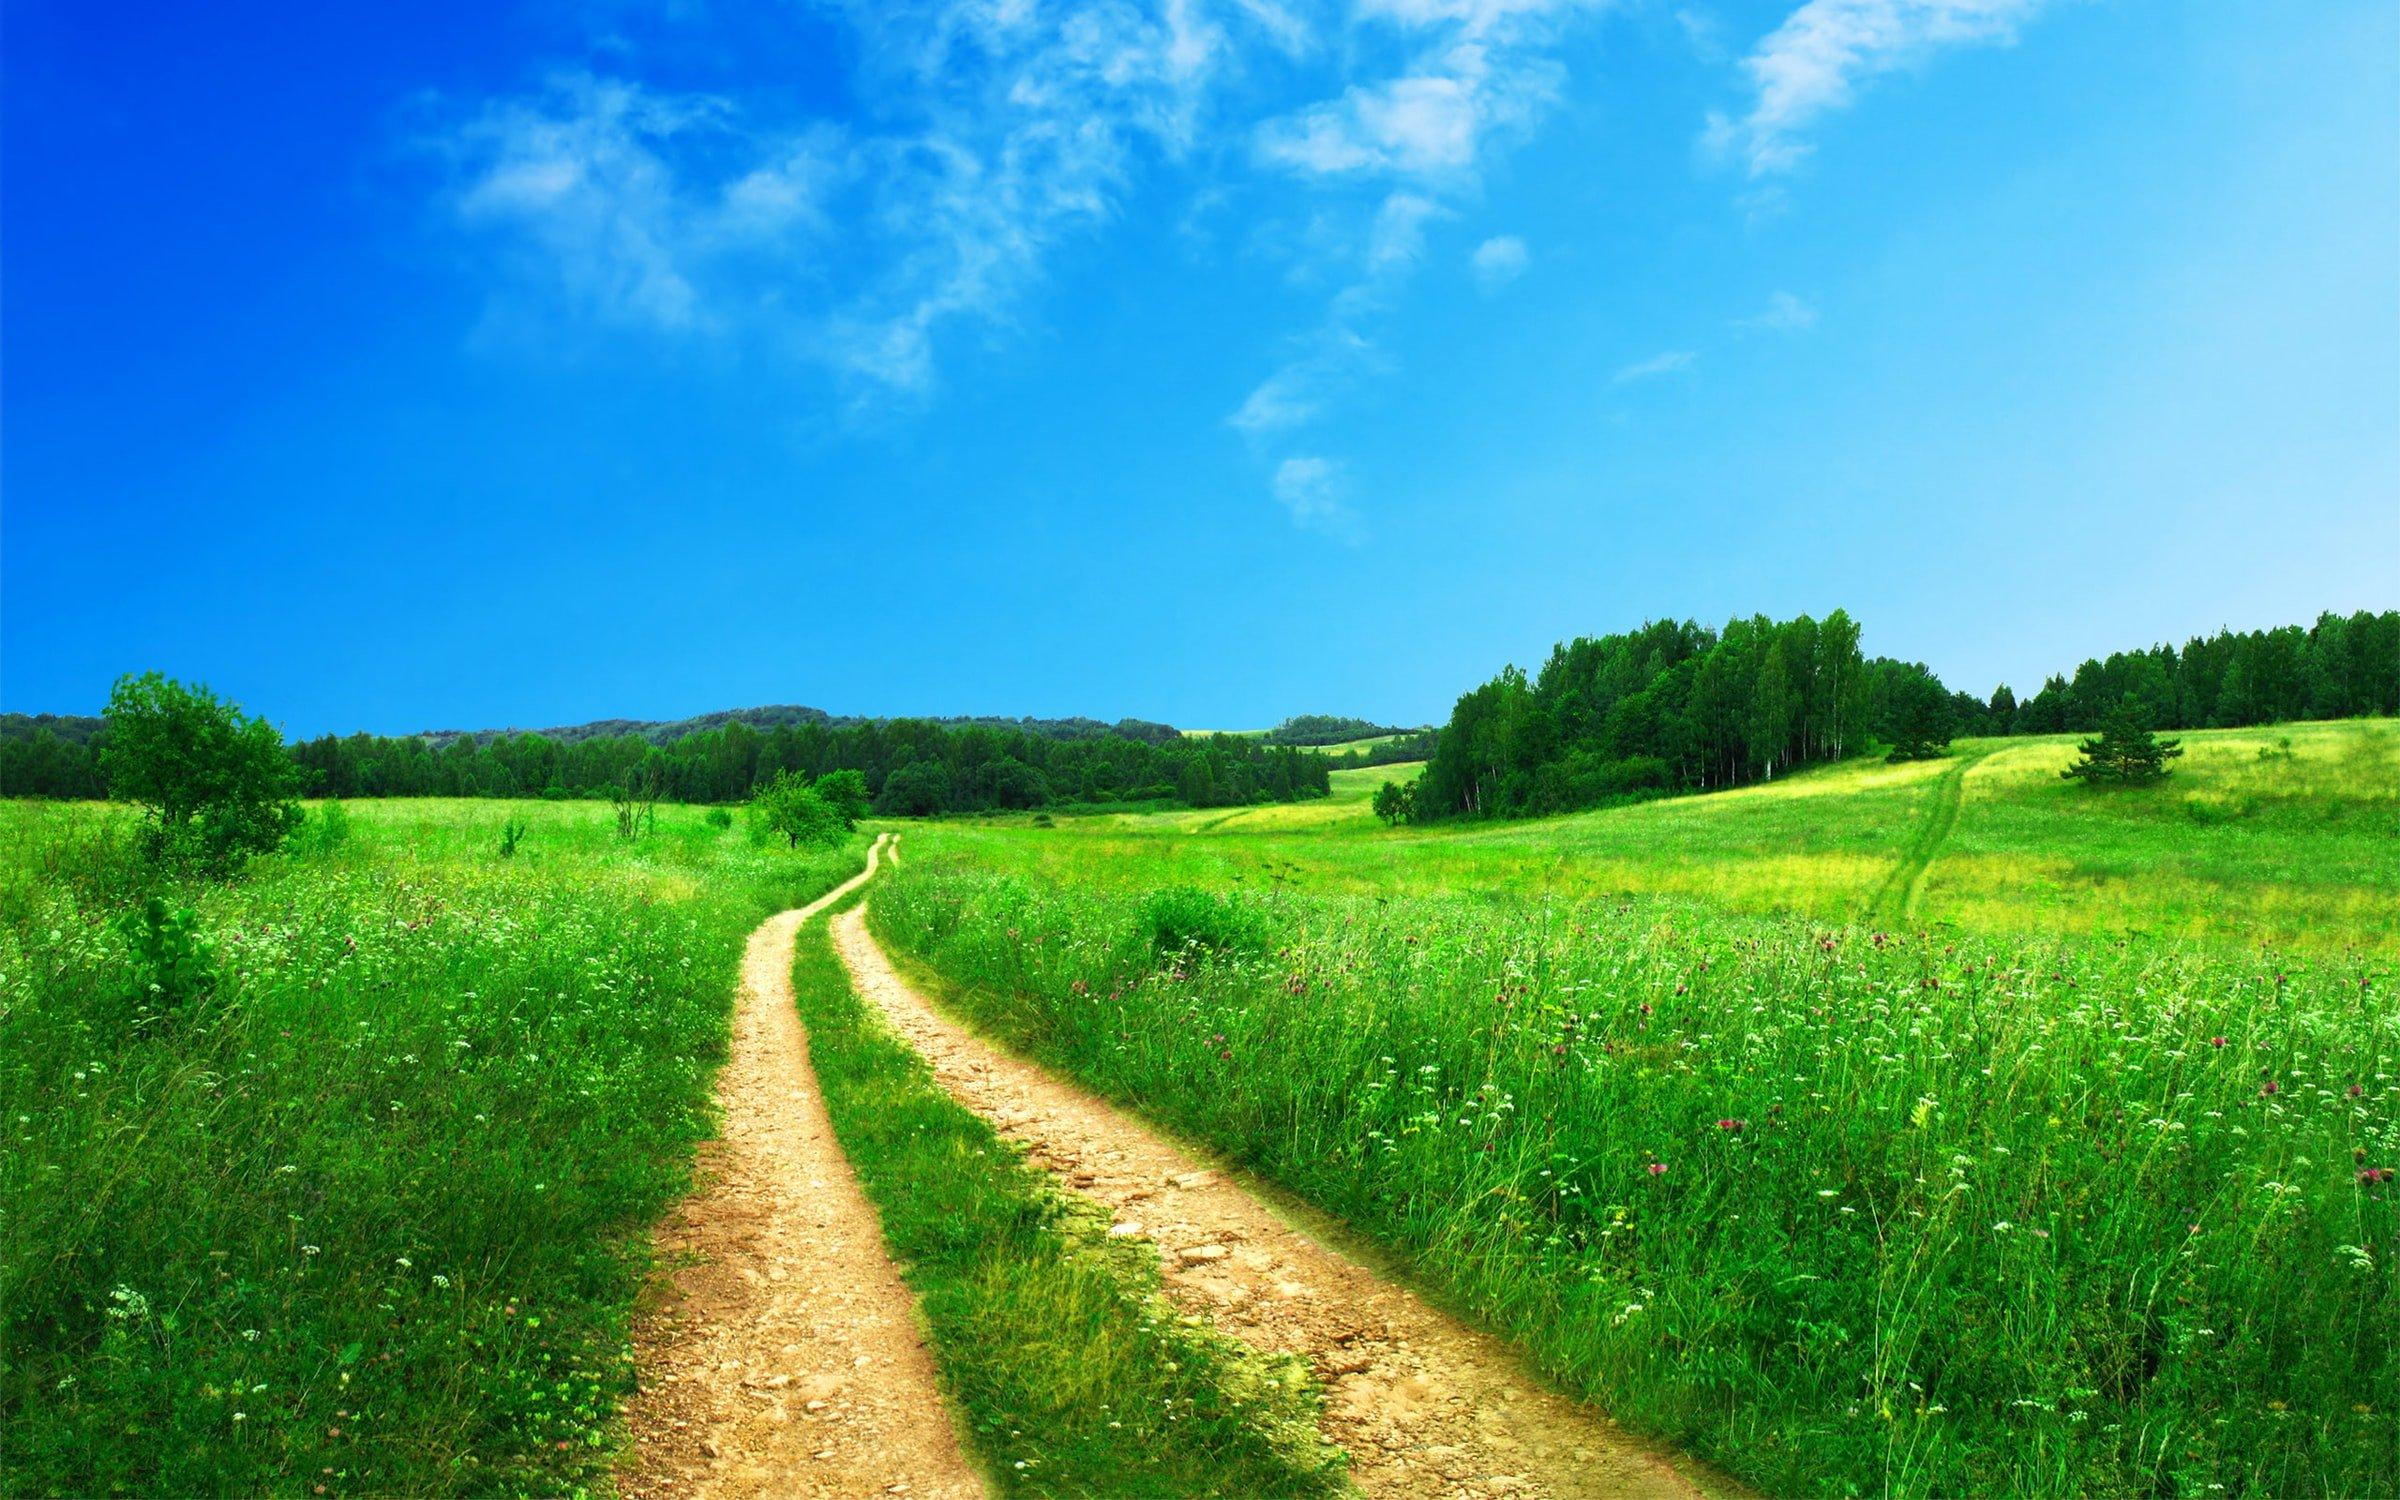 path towards a green field